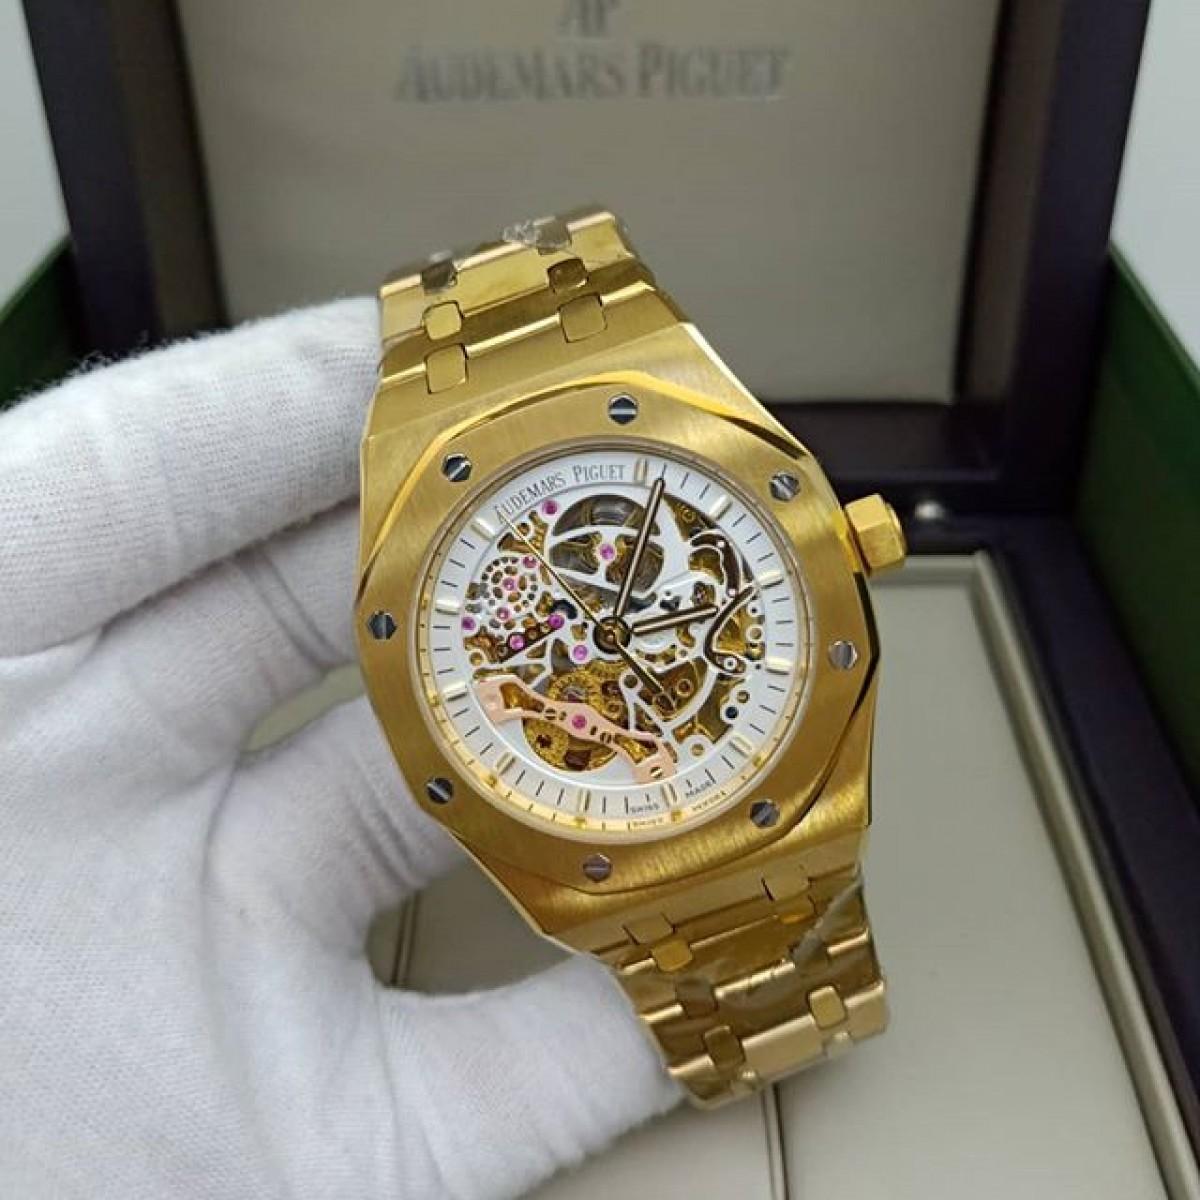 d0e8a437421 Réplica de Relógio Audemars Piguet Royal